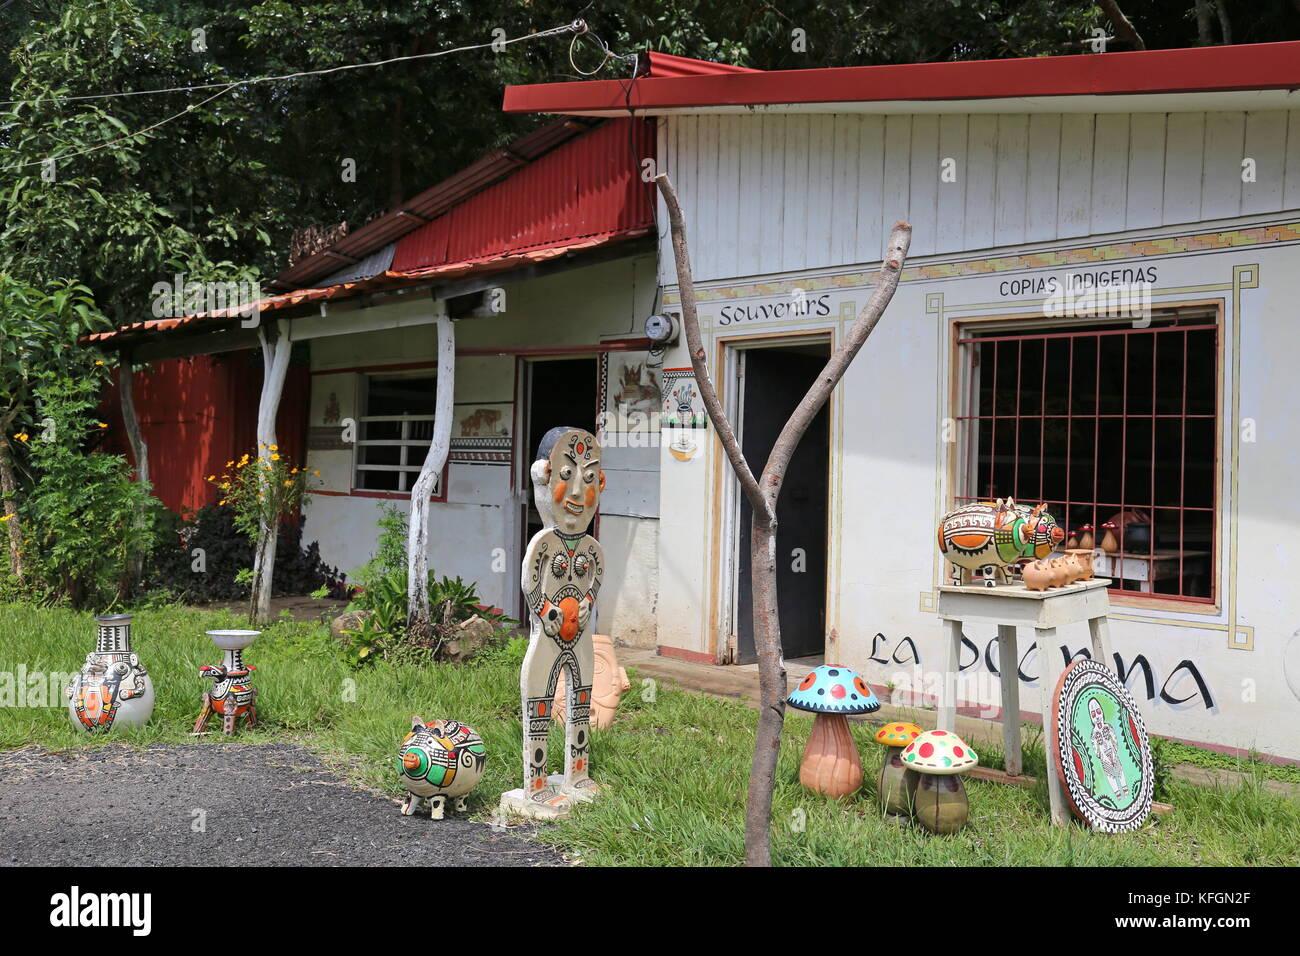 La Ocarina pre-columbian reproductions and ceramics, Avenida Central, Sarchí, Alajuela province, Costa Rica, - Stock Image